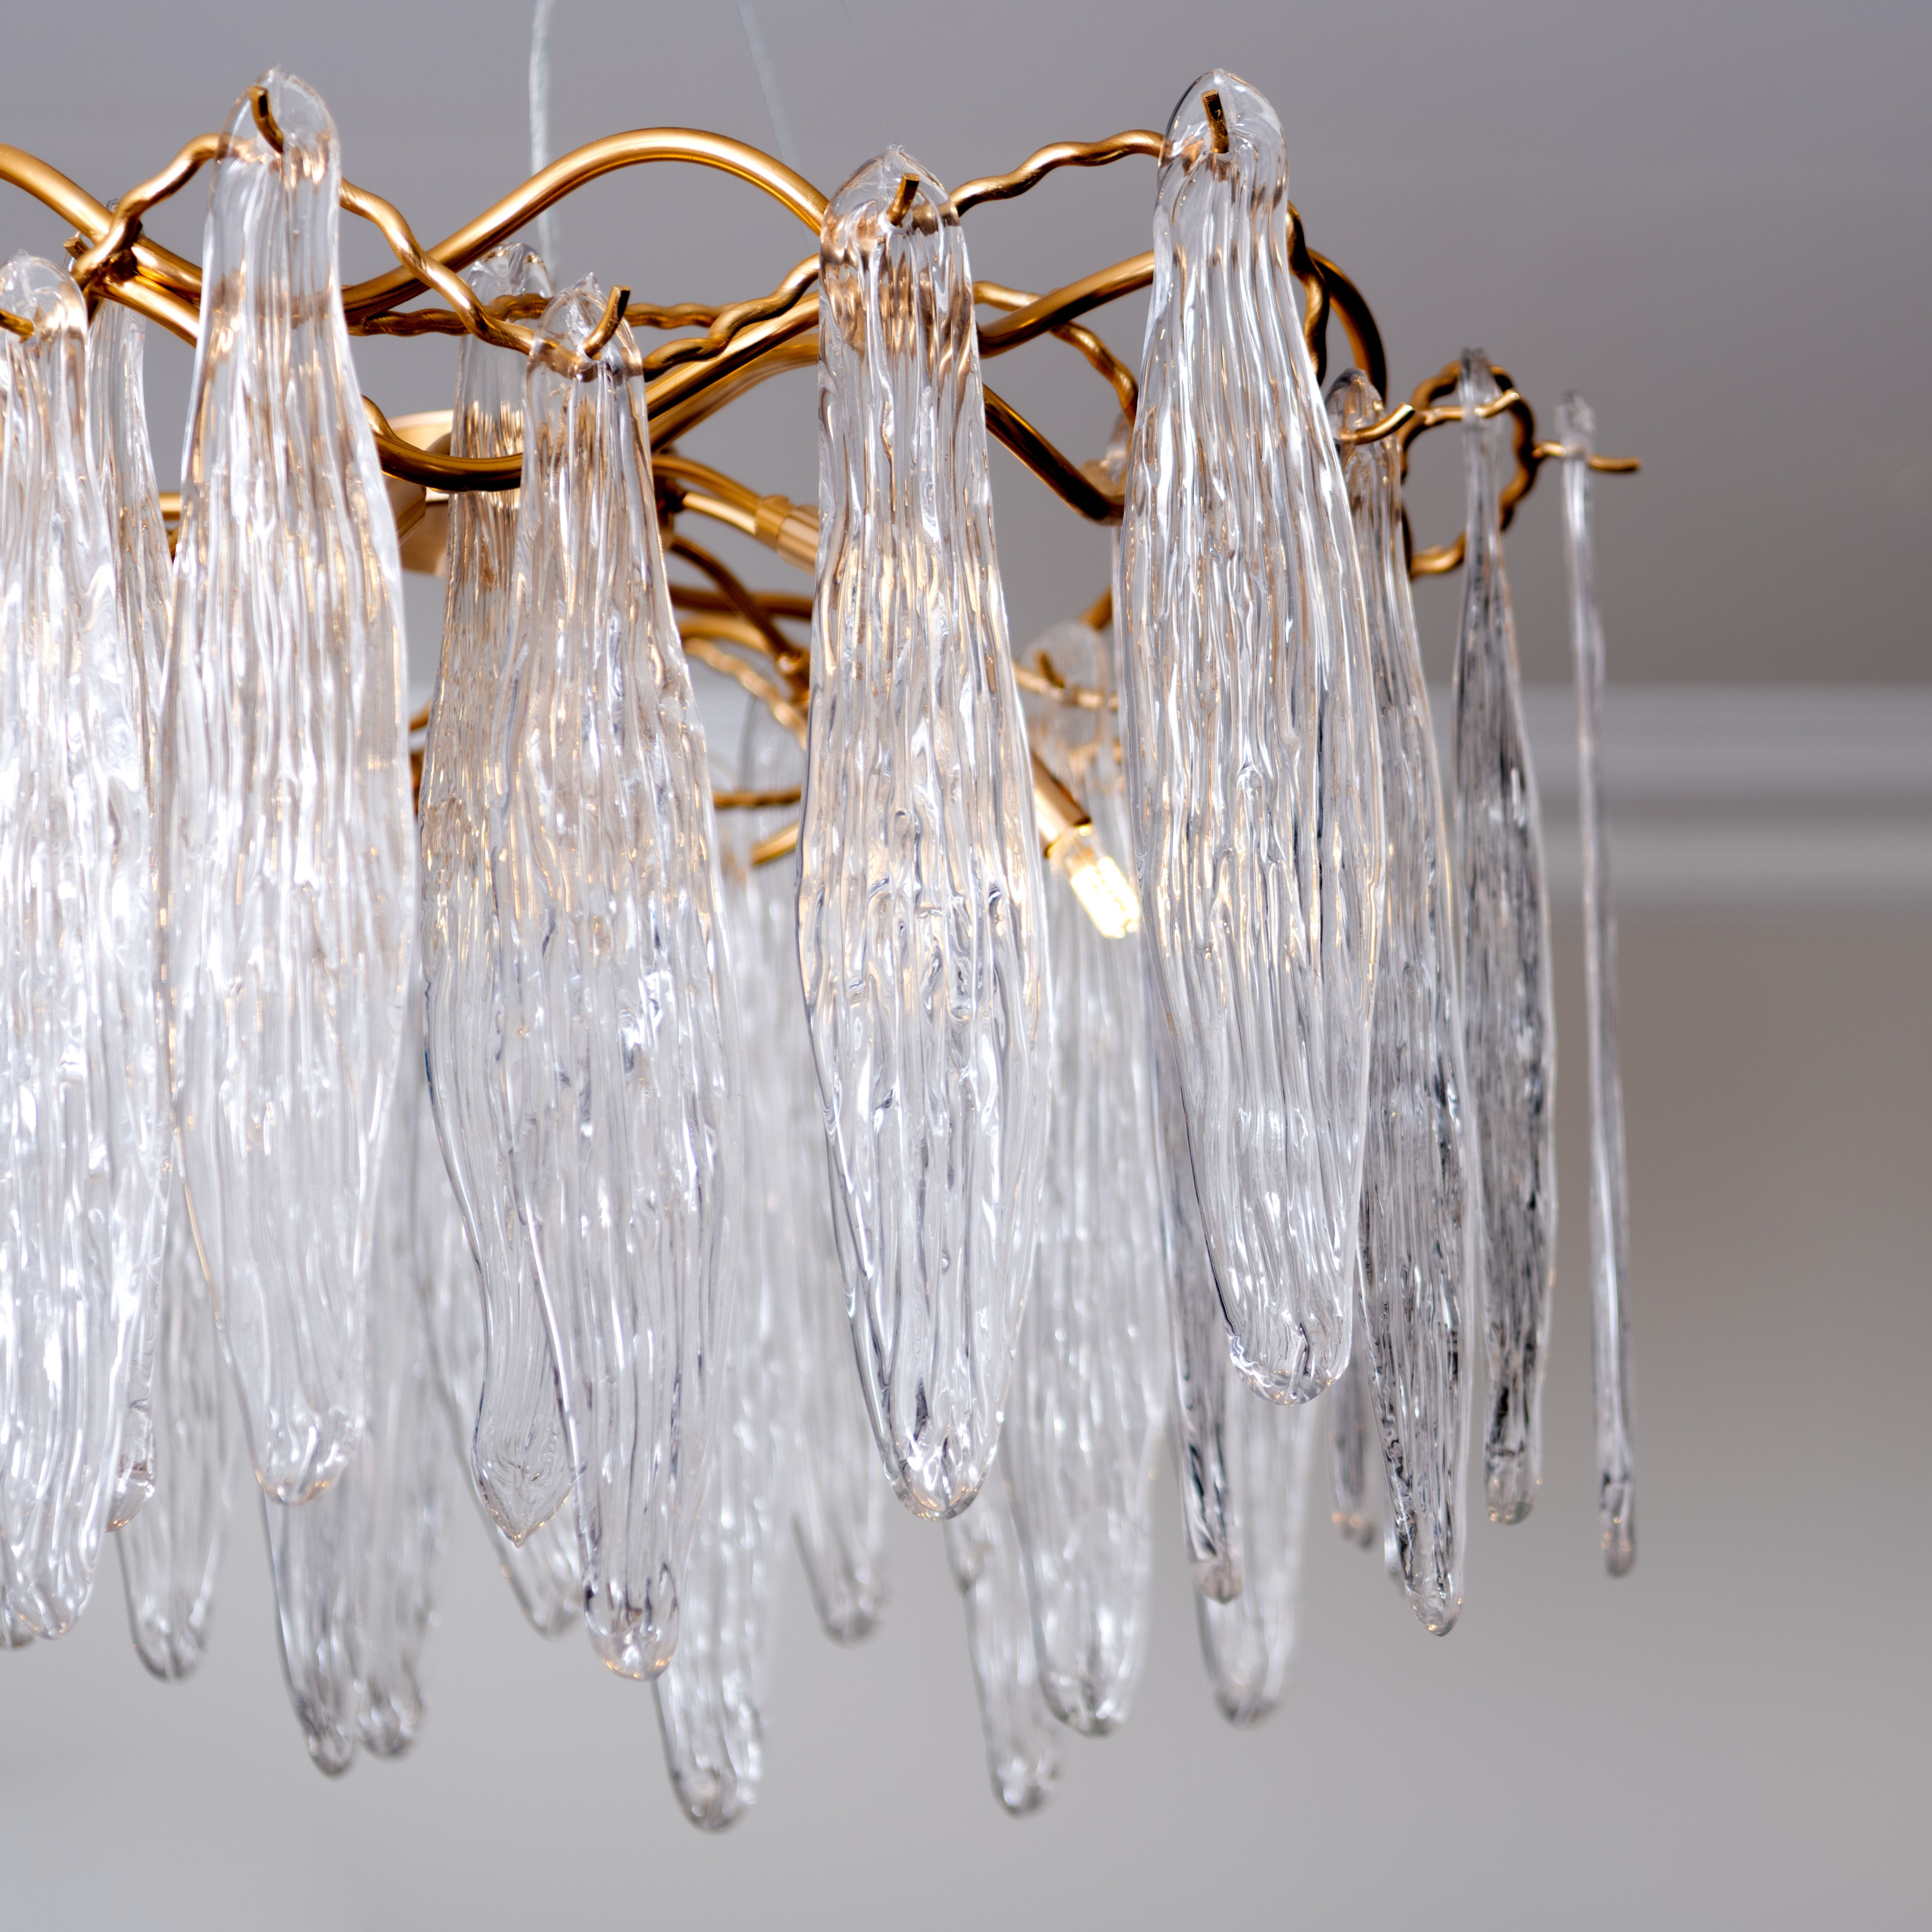 أضىء مساحتك بثريا لافتة قم بزيارة متاجرنا لمزيد من التصاميم Illuminate Your Home With Our Eye Catching Chandelier Visit Our Store Ceiling Lights Light Decor